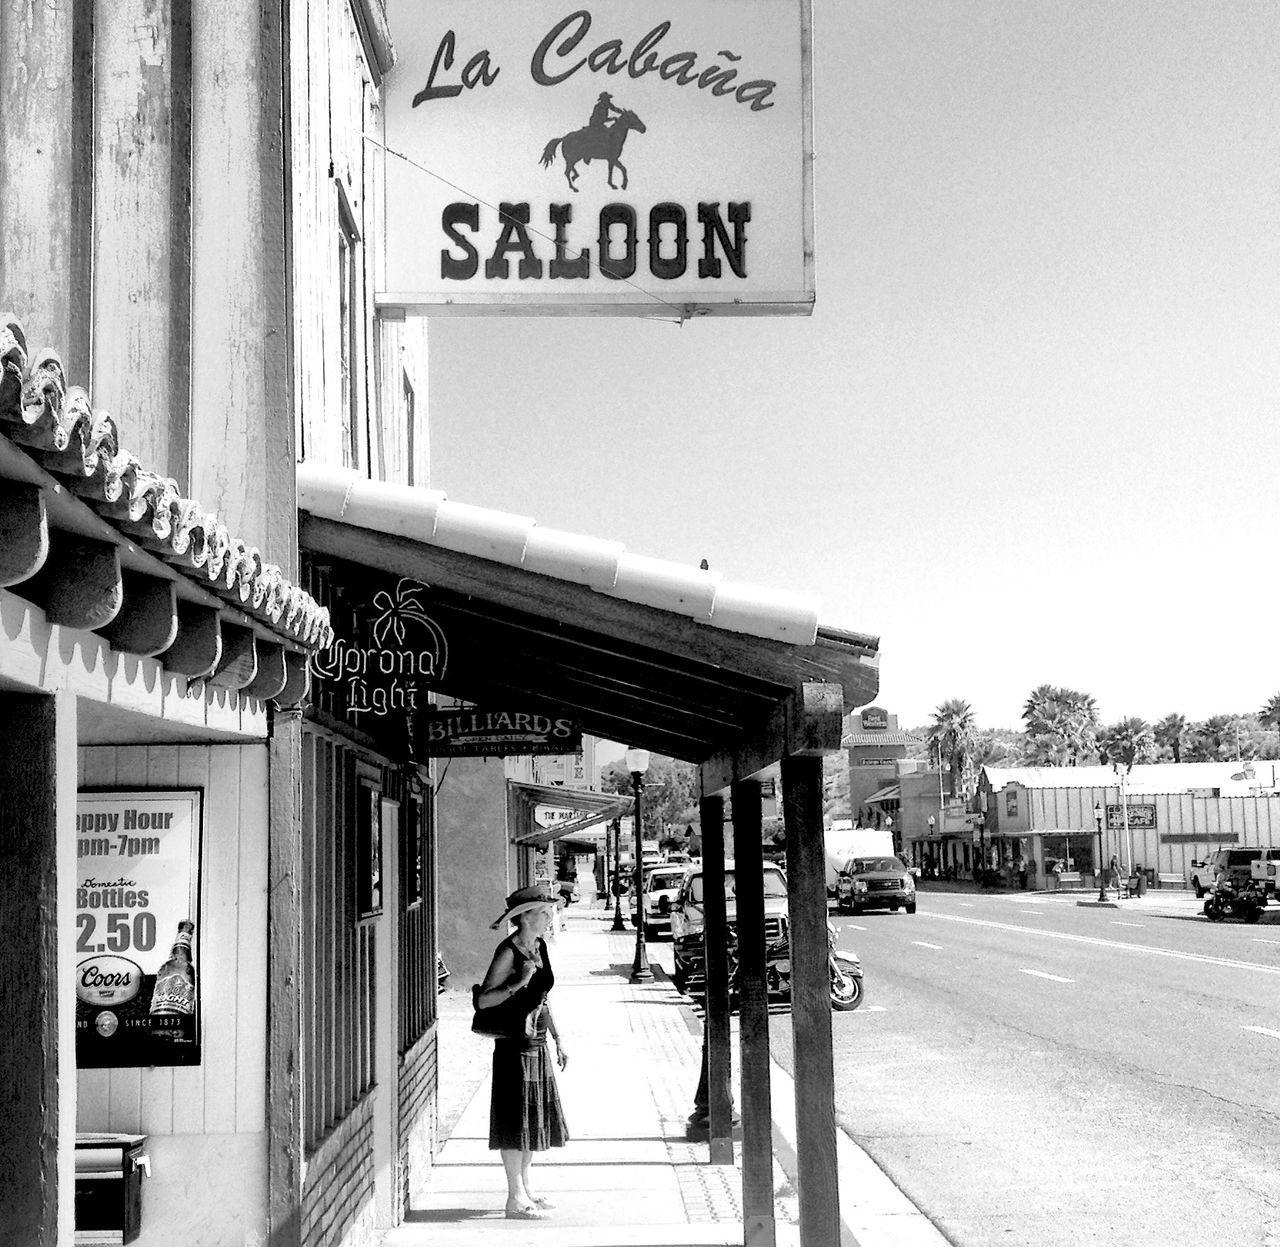 QVHoughPhoto Arizona Wickenburg Lacabaña Saloon Southwest  Western Blackandwhite IPhoneography IPhone4s